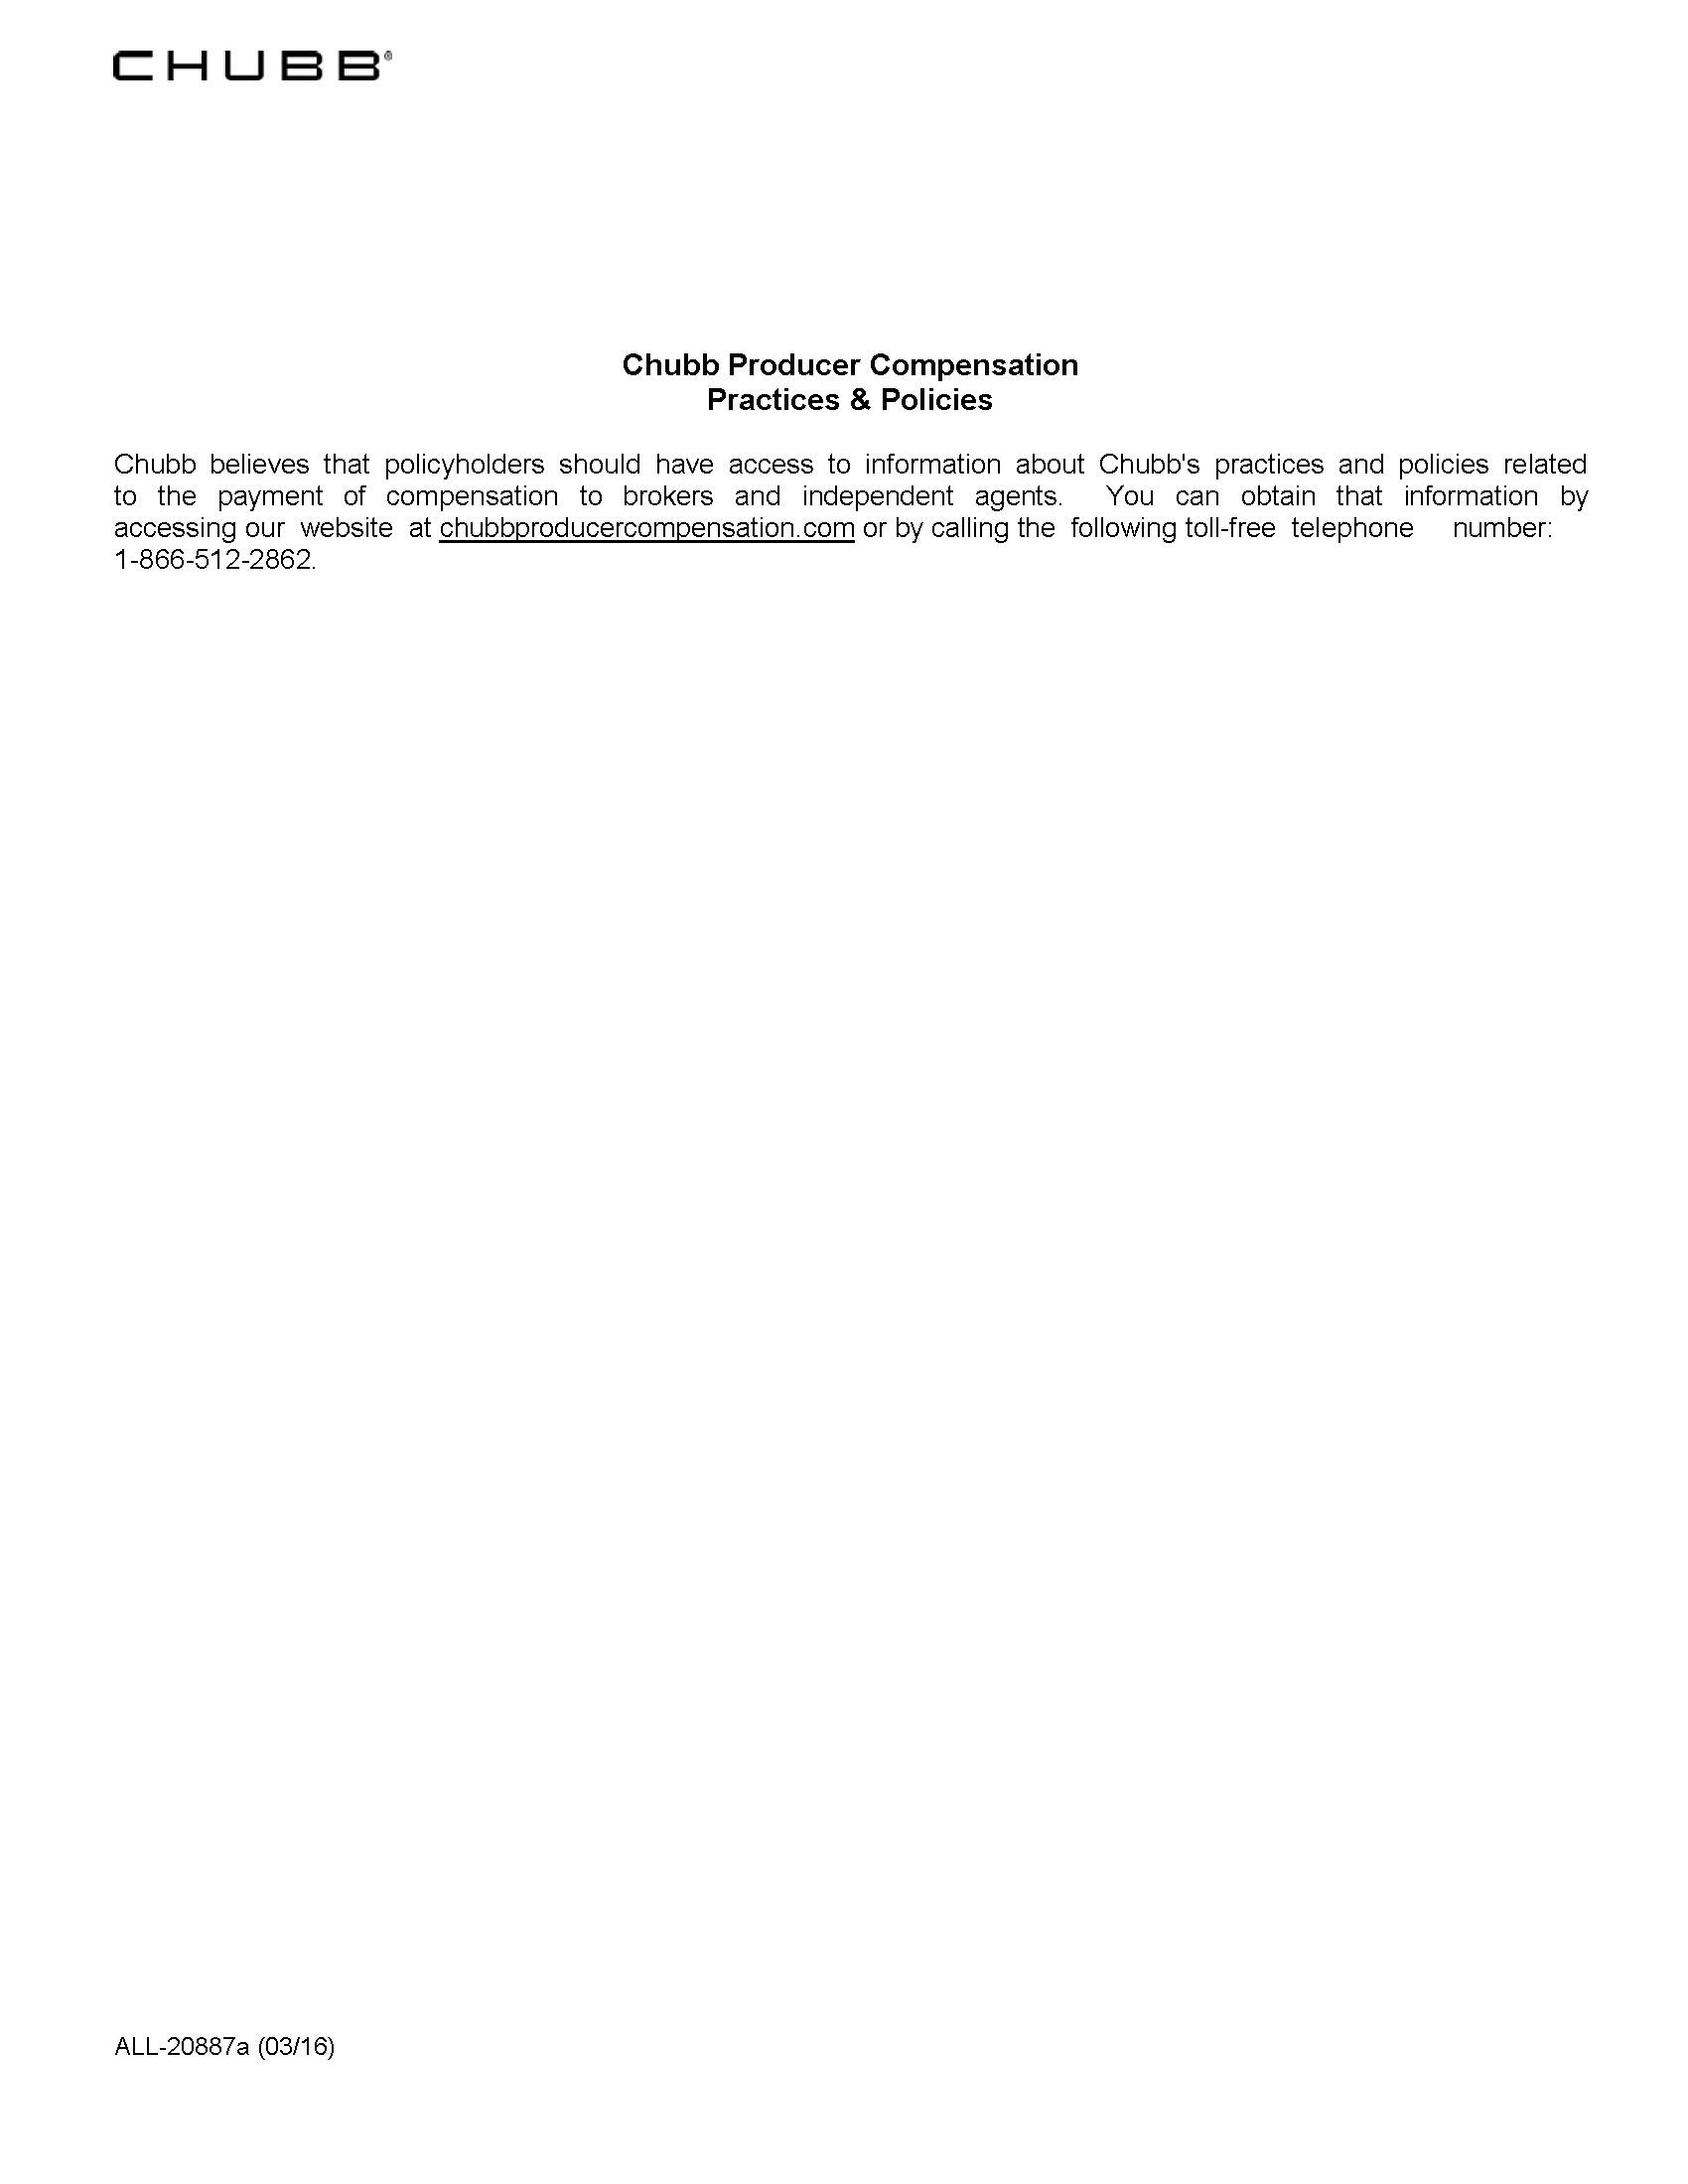 A2019CRIMCHUBBFIBOND38.JPG